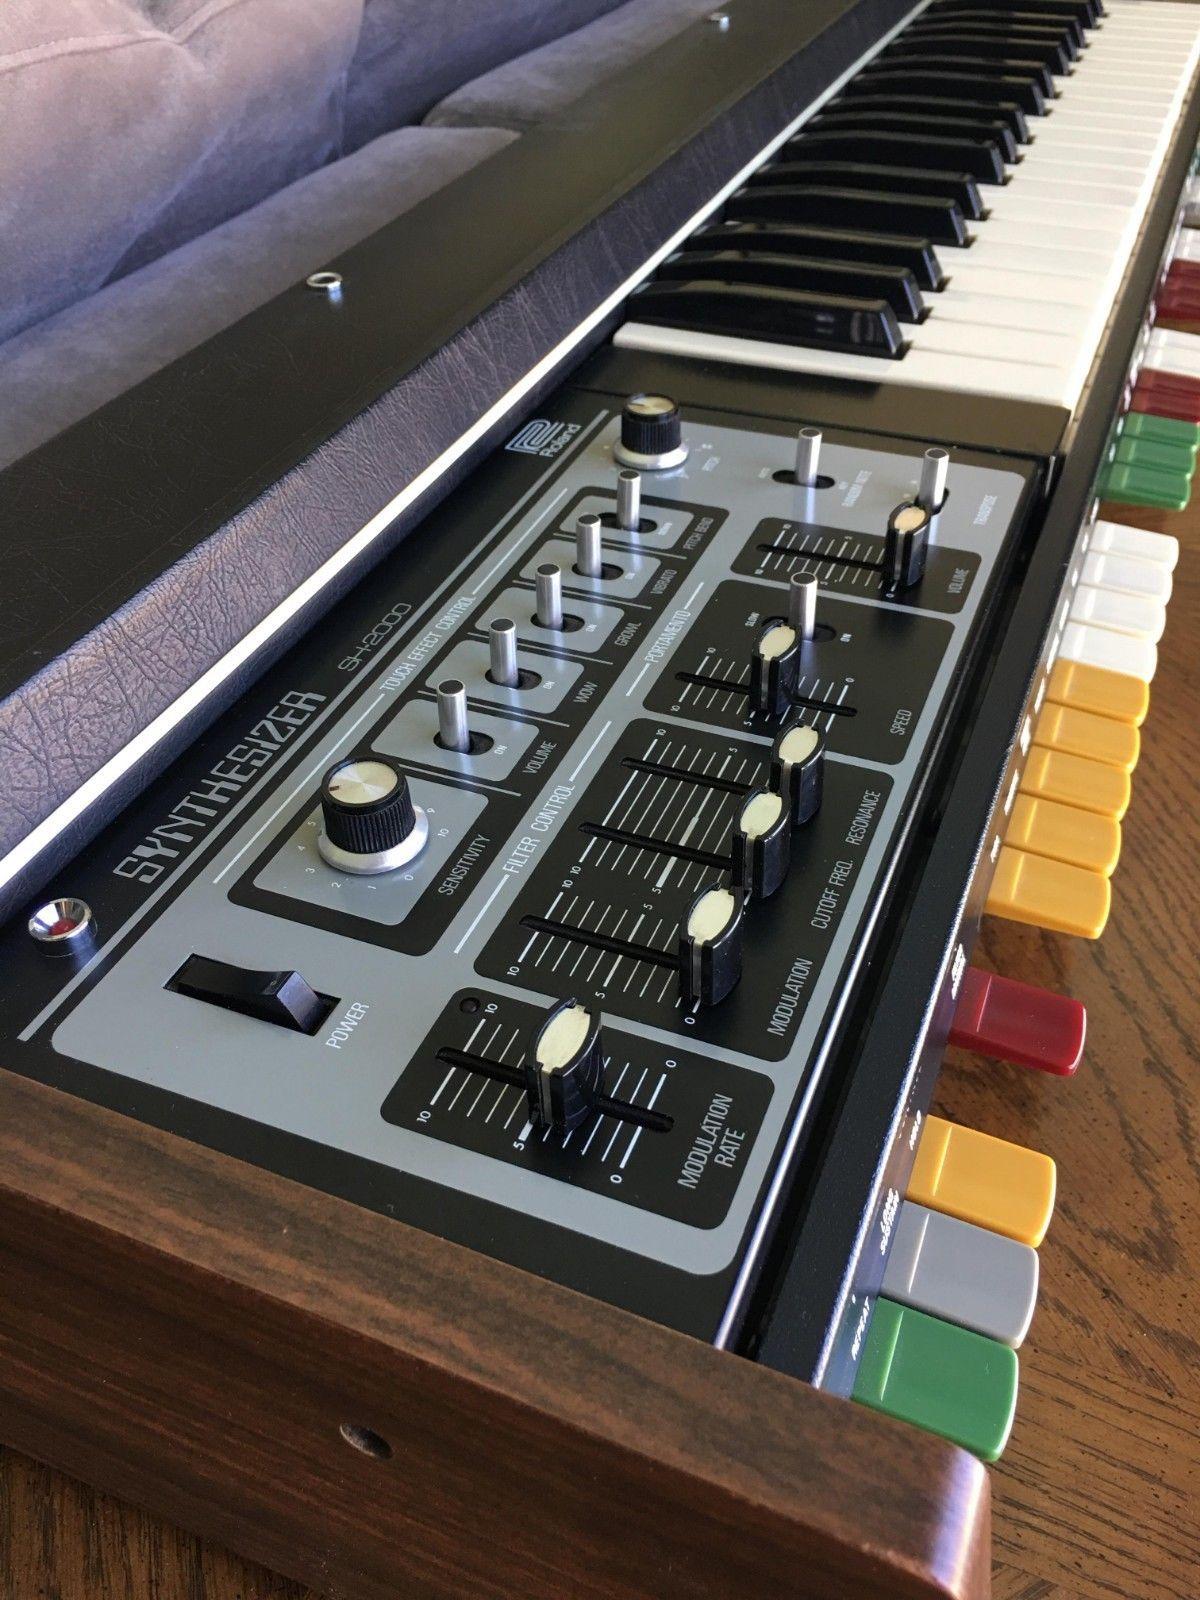 Rare Vintage Roland SH-2000 analog synthesizer with Moog cascade